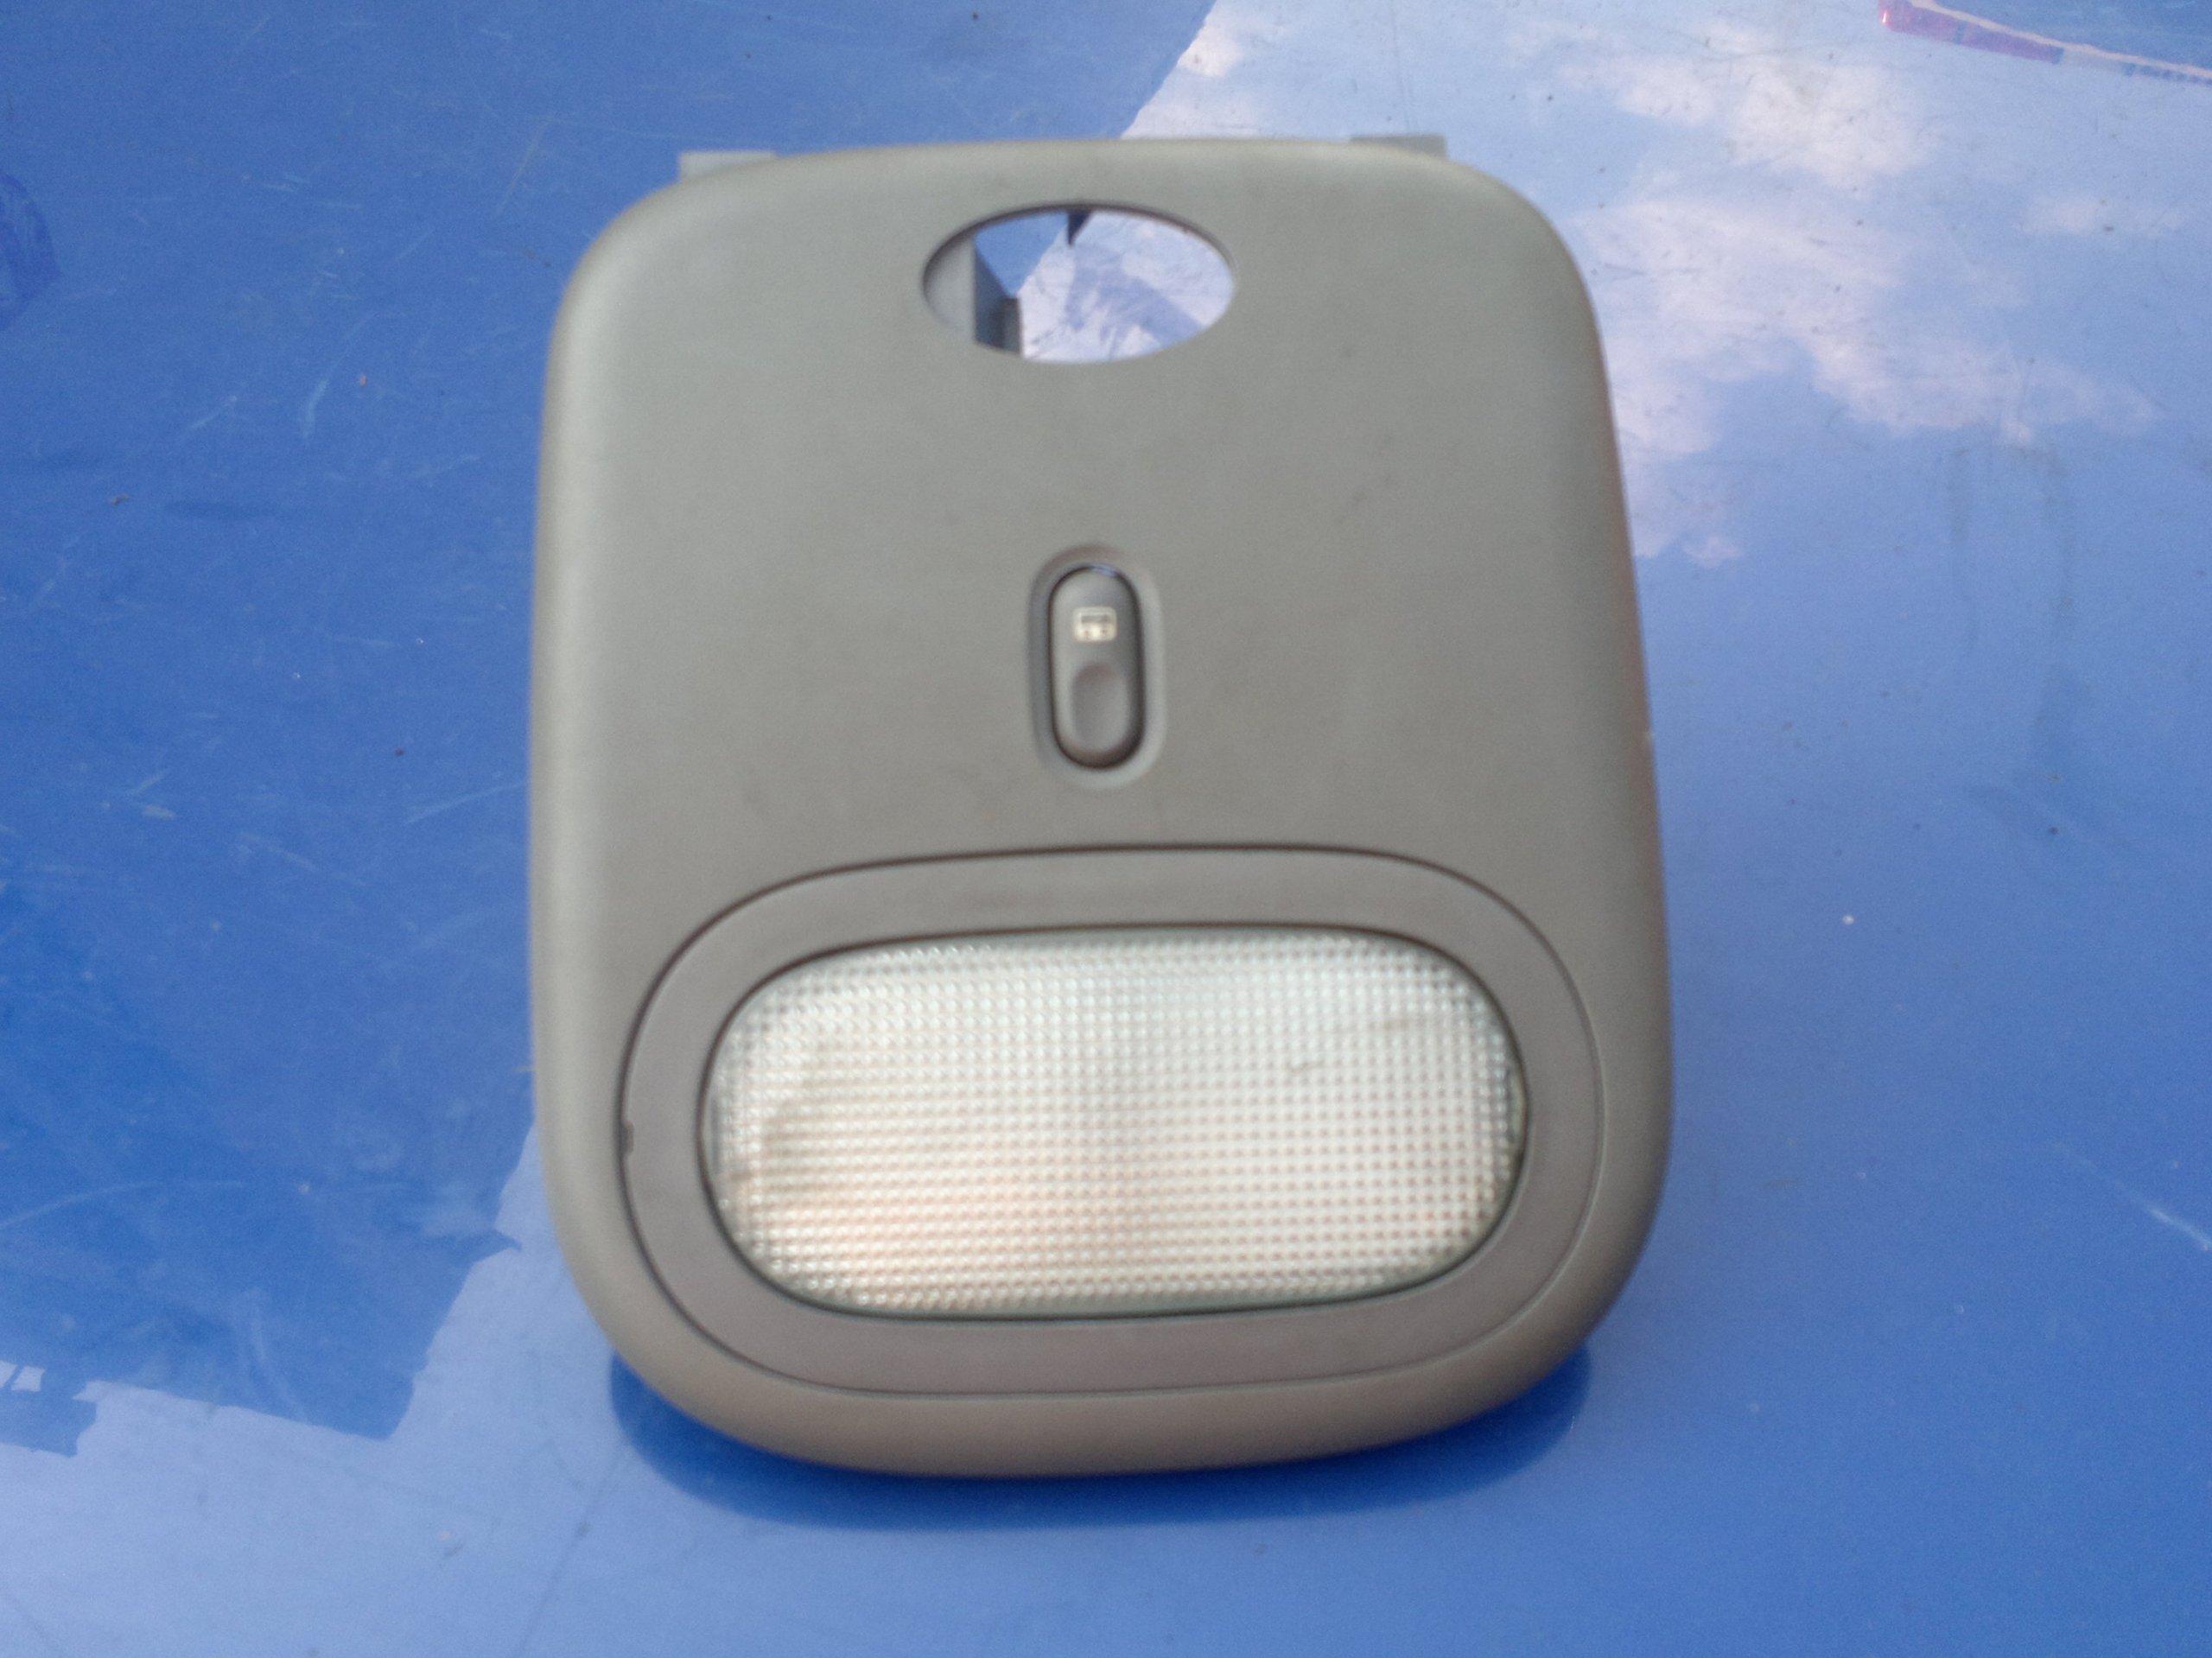 Renault Clio Ii Lampka Oświetlenia Kabiny 7039533574